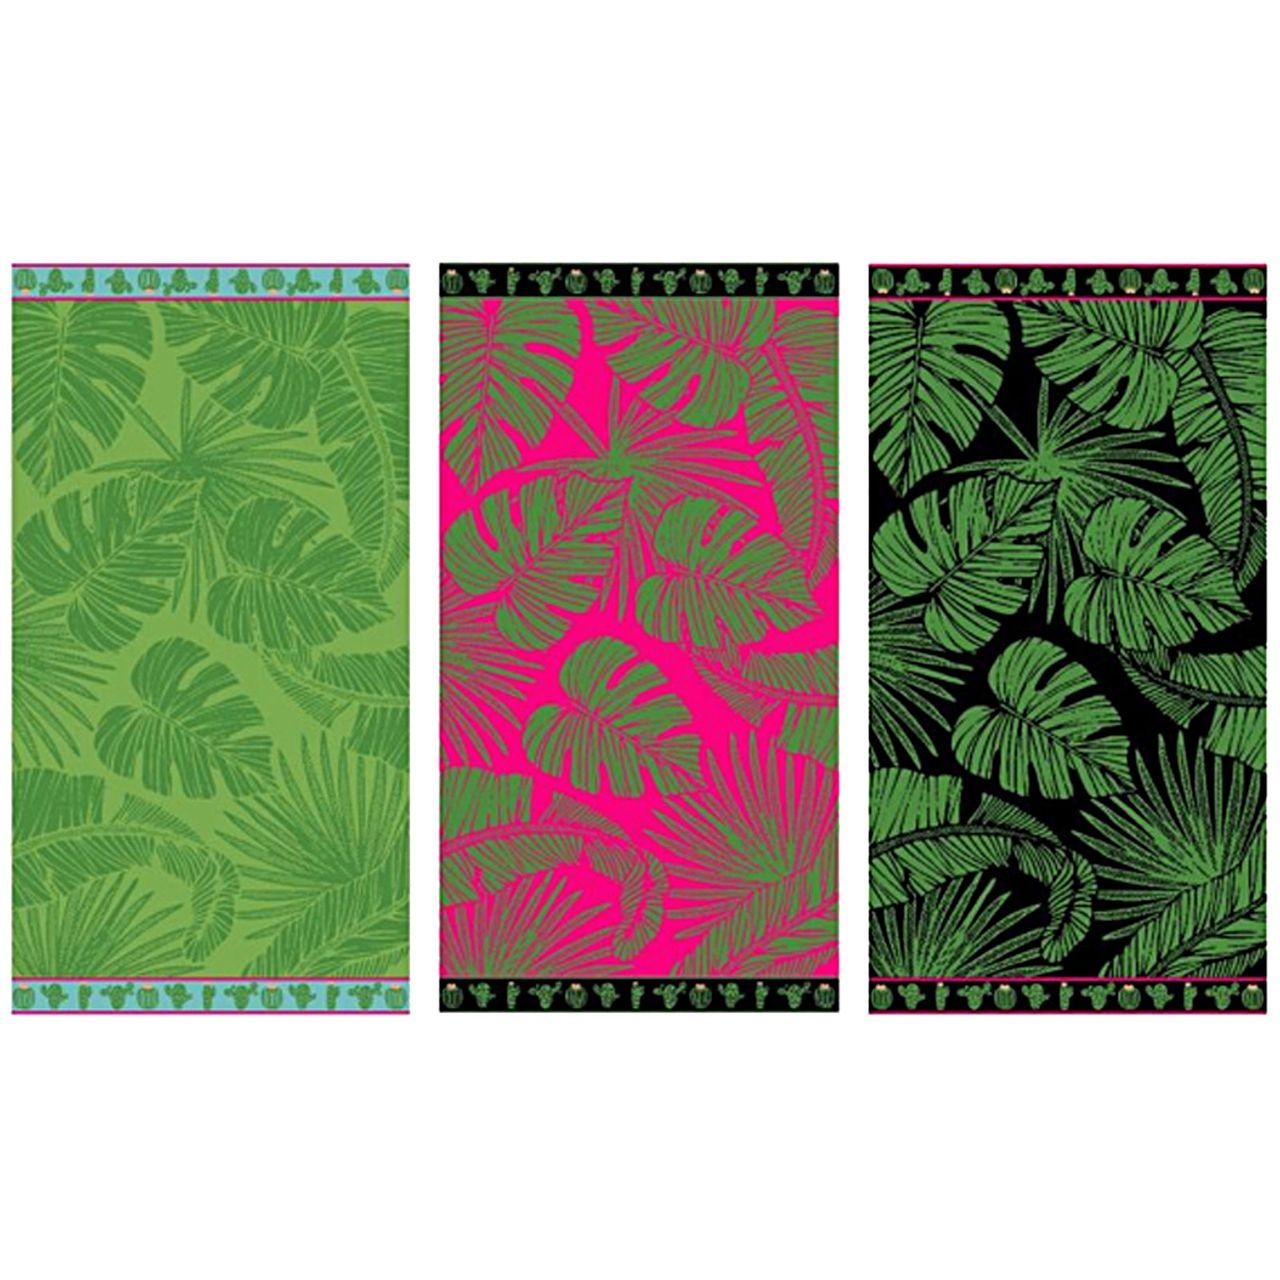 LEX Saunatuch Handtuch Duschtuch Tropical verschiedene Farben Baumwolle 90 x 170 cm